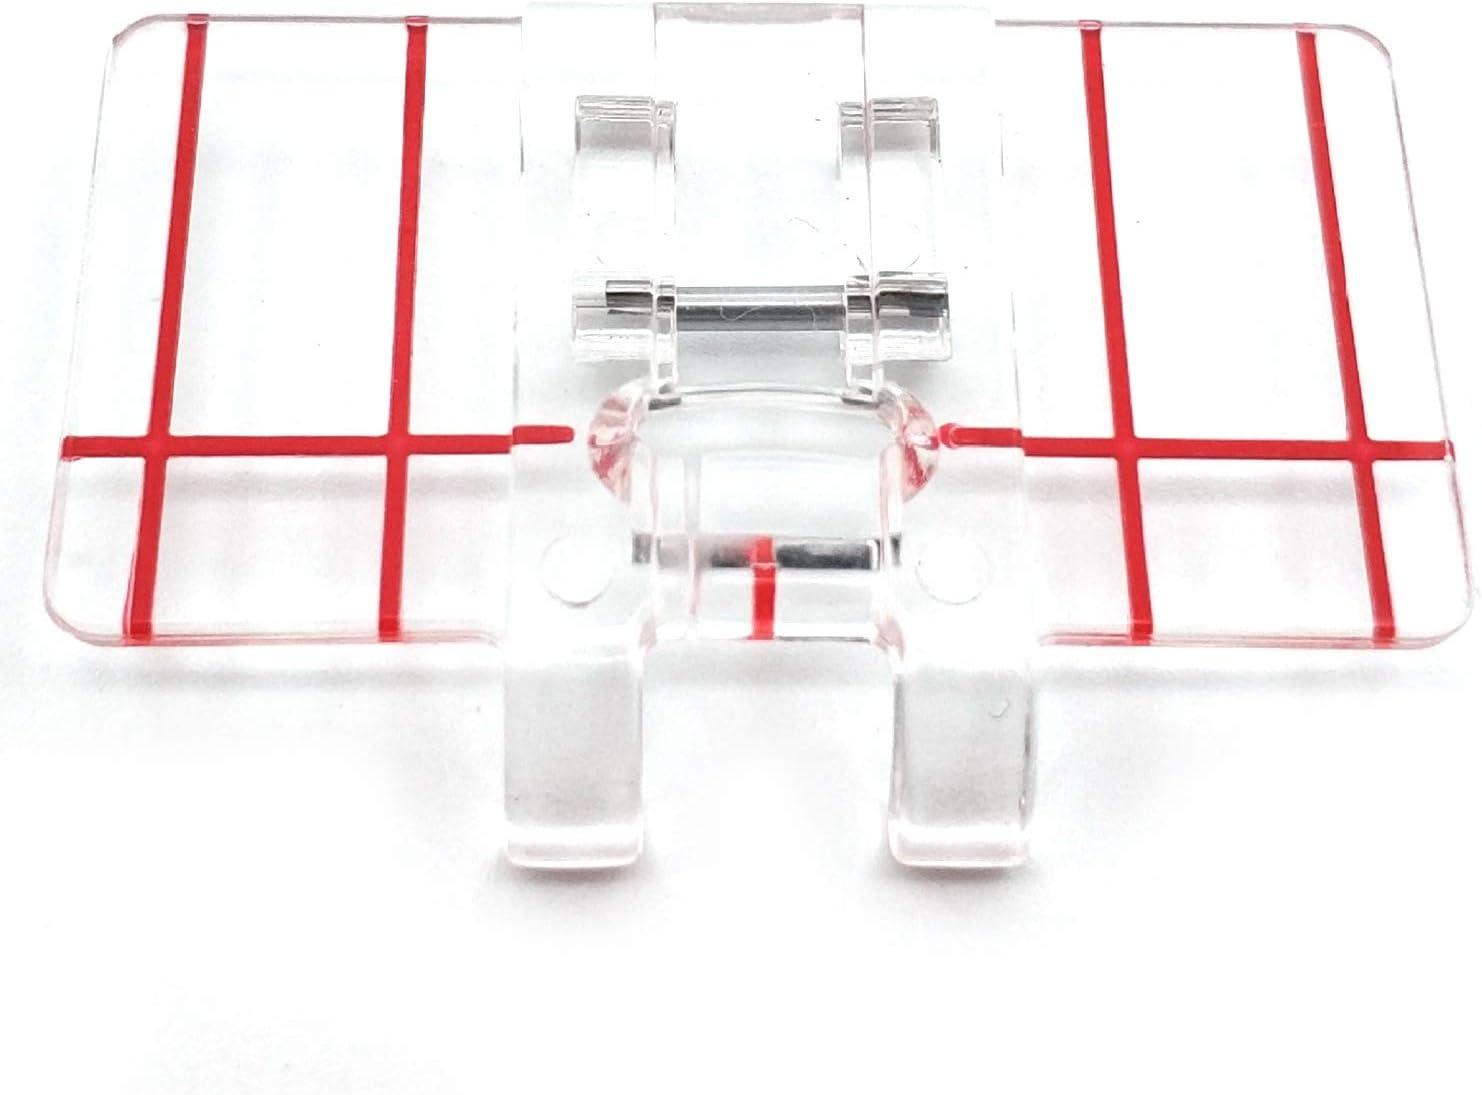 RETYLY Simple Plastico Transparente Prensatelas De Pie De Paralelo ...